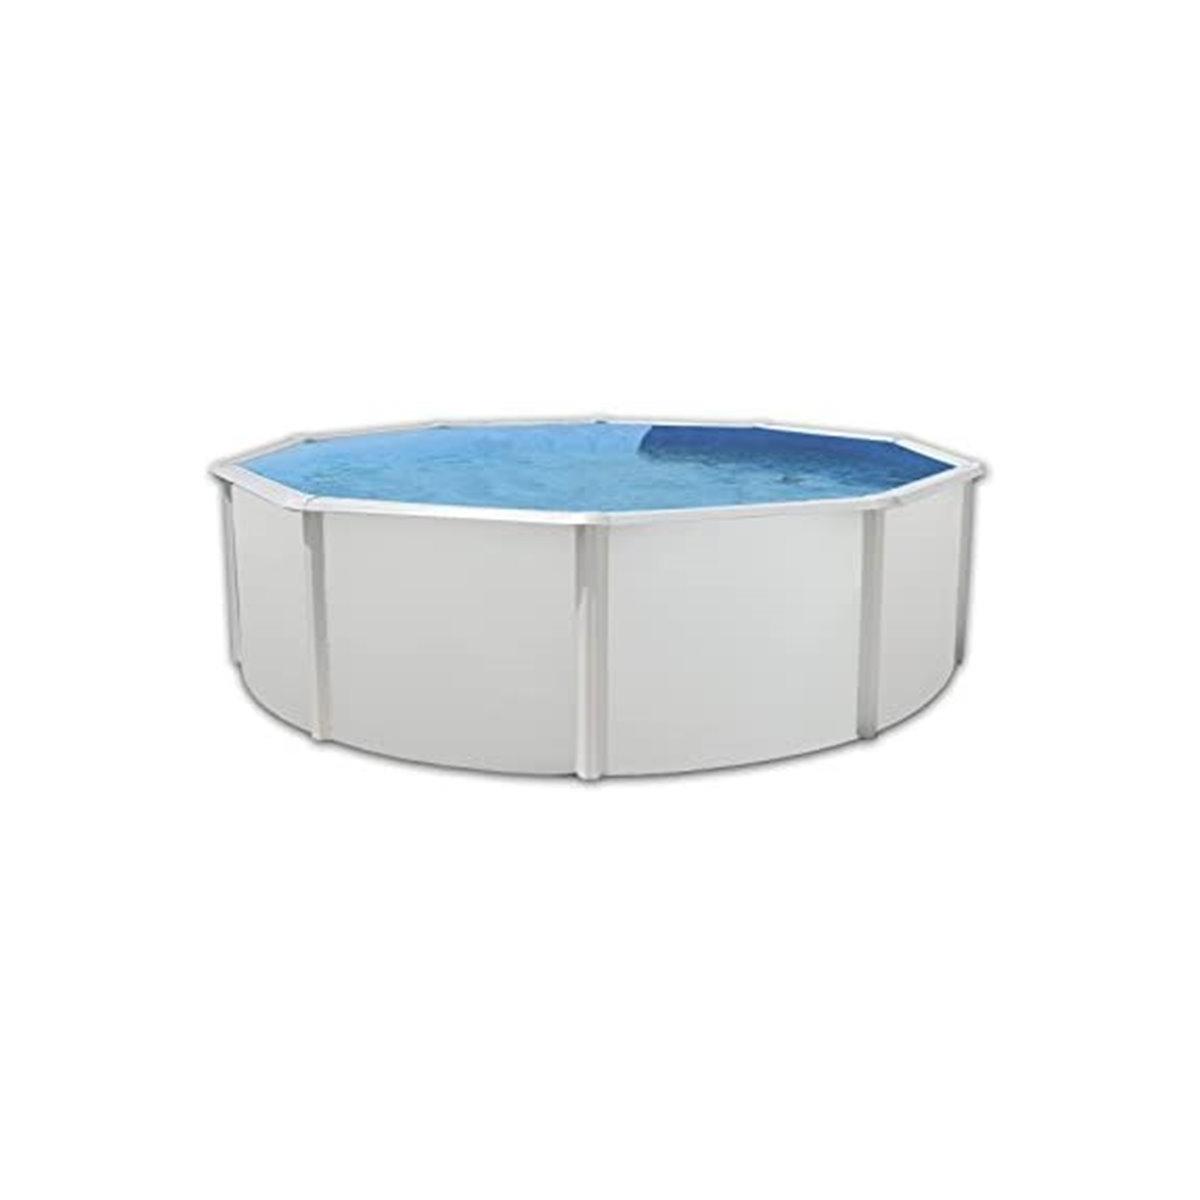 Piscina Desmontable Toi Circular 320X90 PTC302